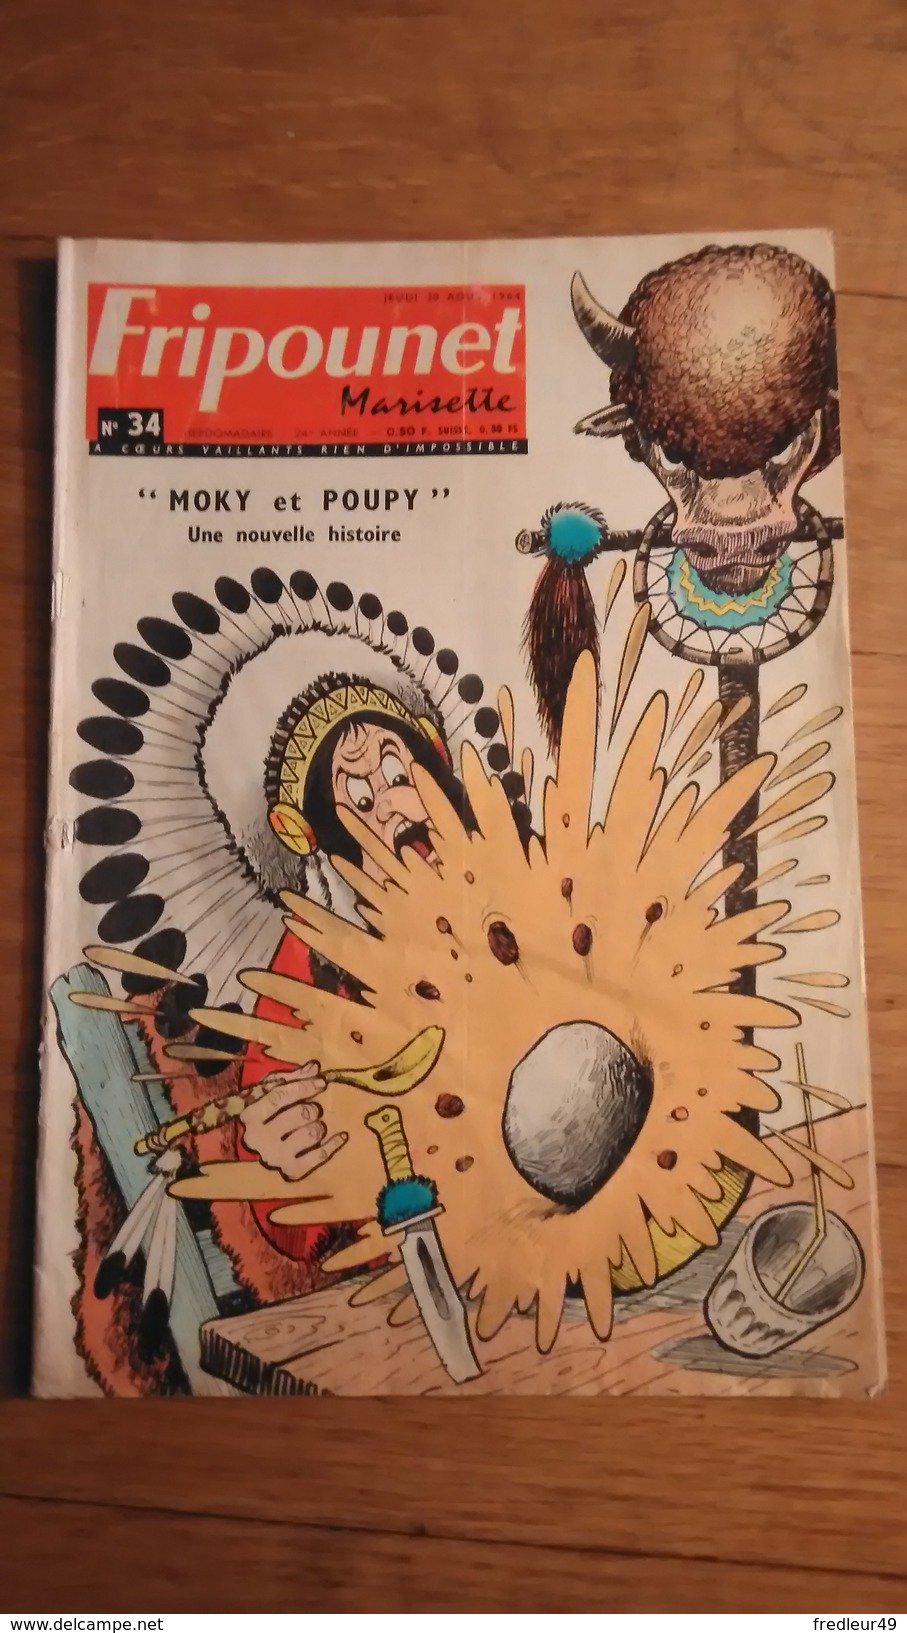 Fripounet Marisette N° 34 - 1964 - Fripounet